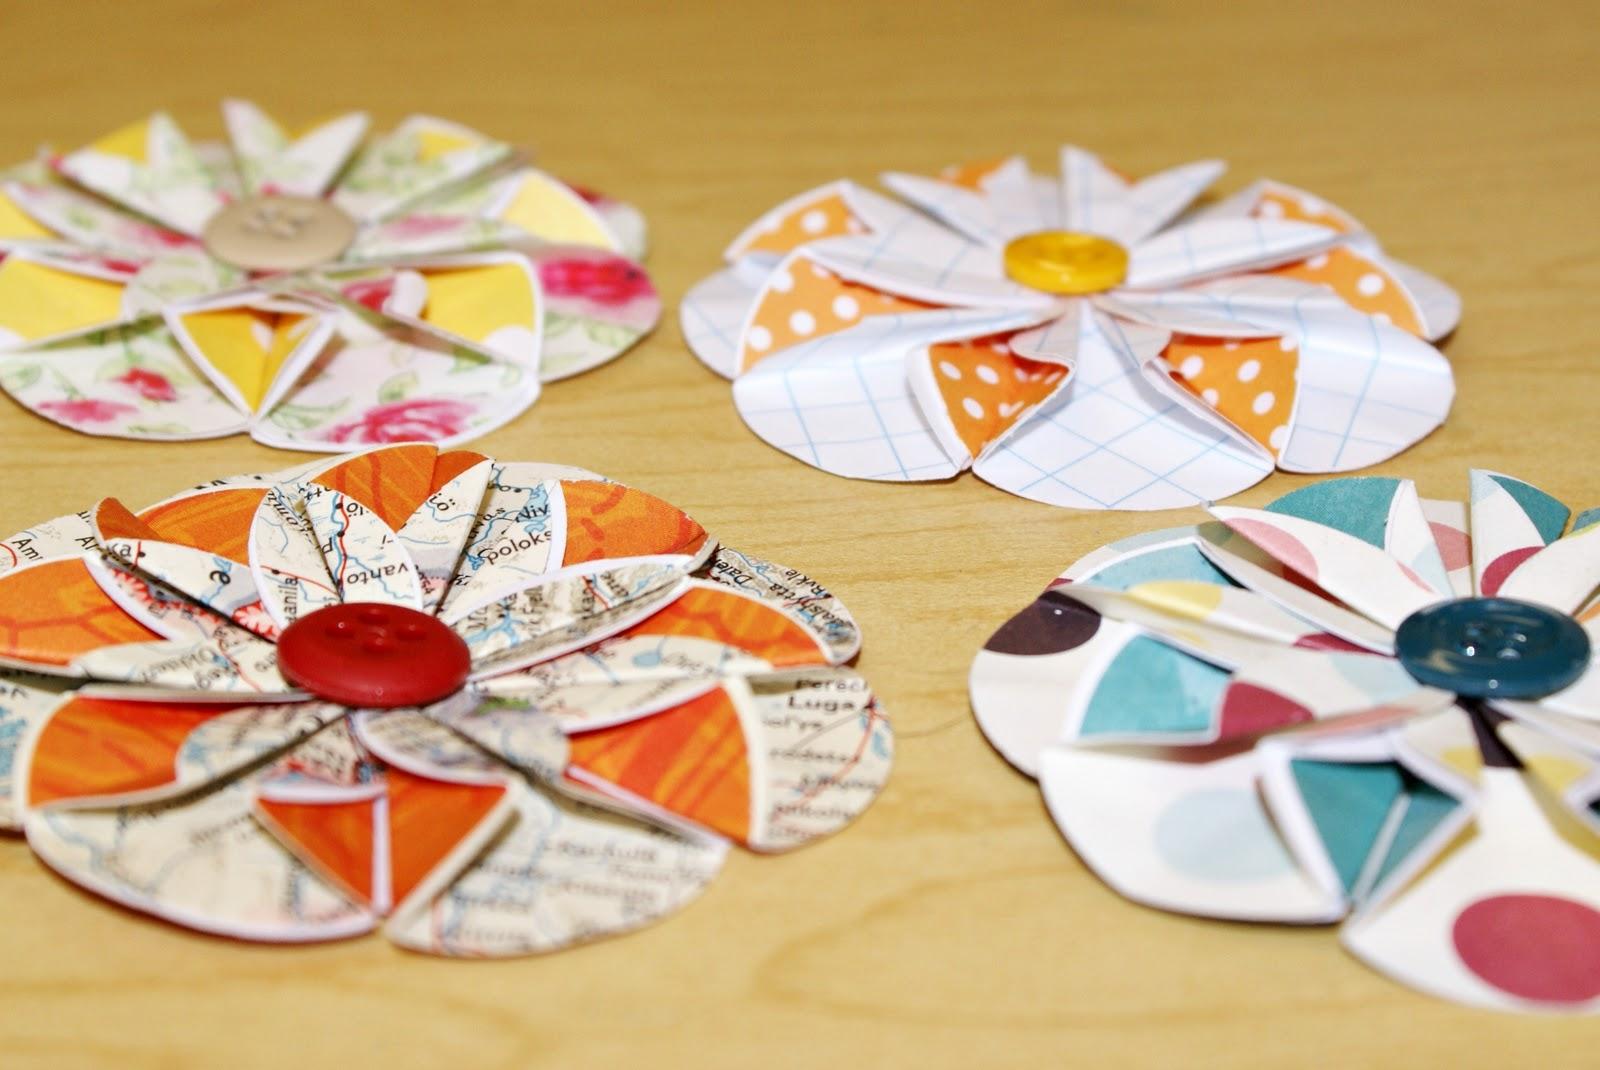 How to scrapbook flowers - Paper Flower Tutorial